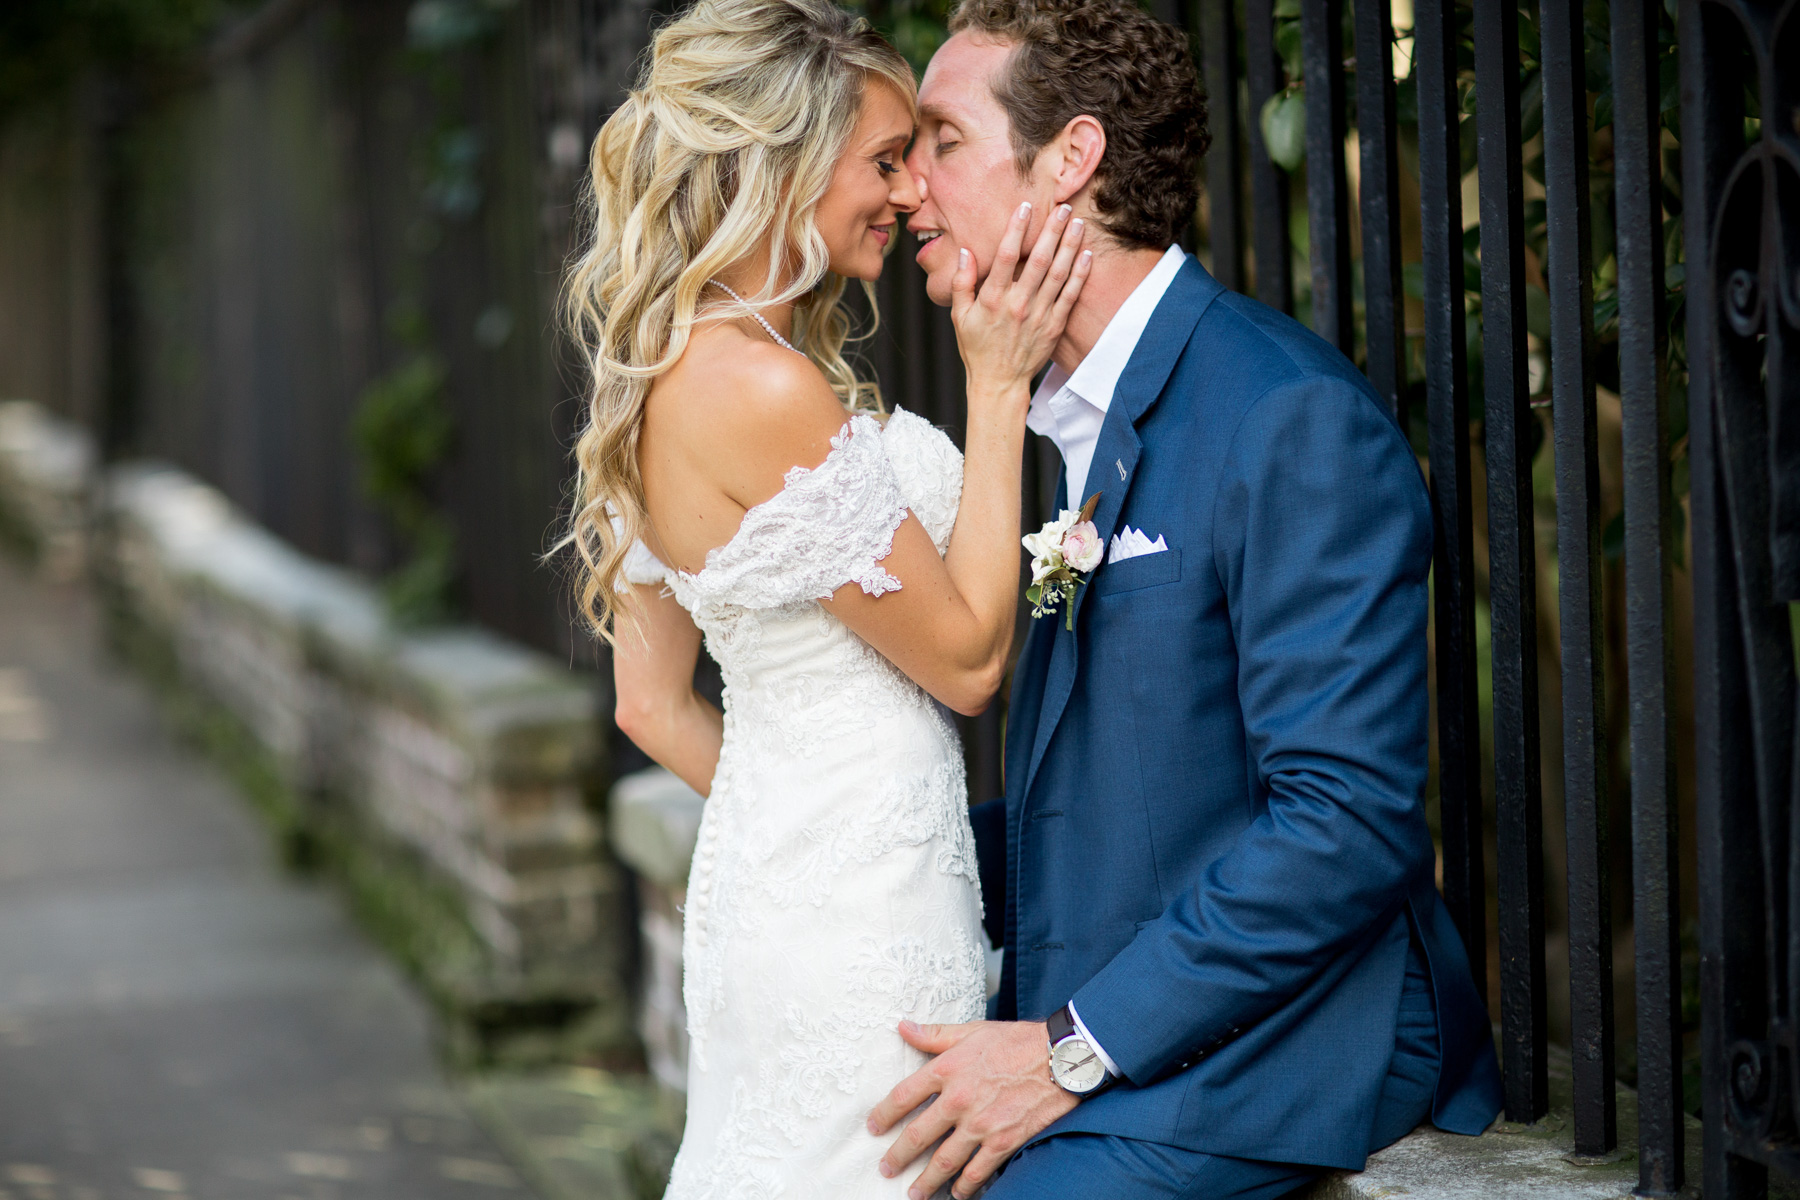 Charleston-best-wedding-photographer-SC-13.jpg